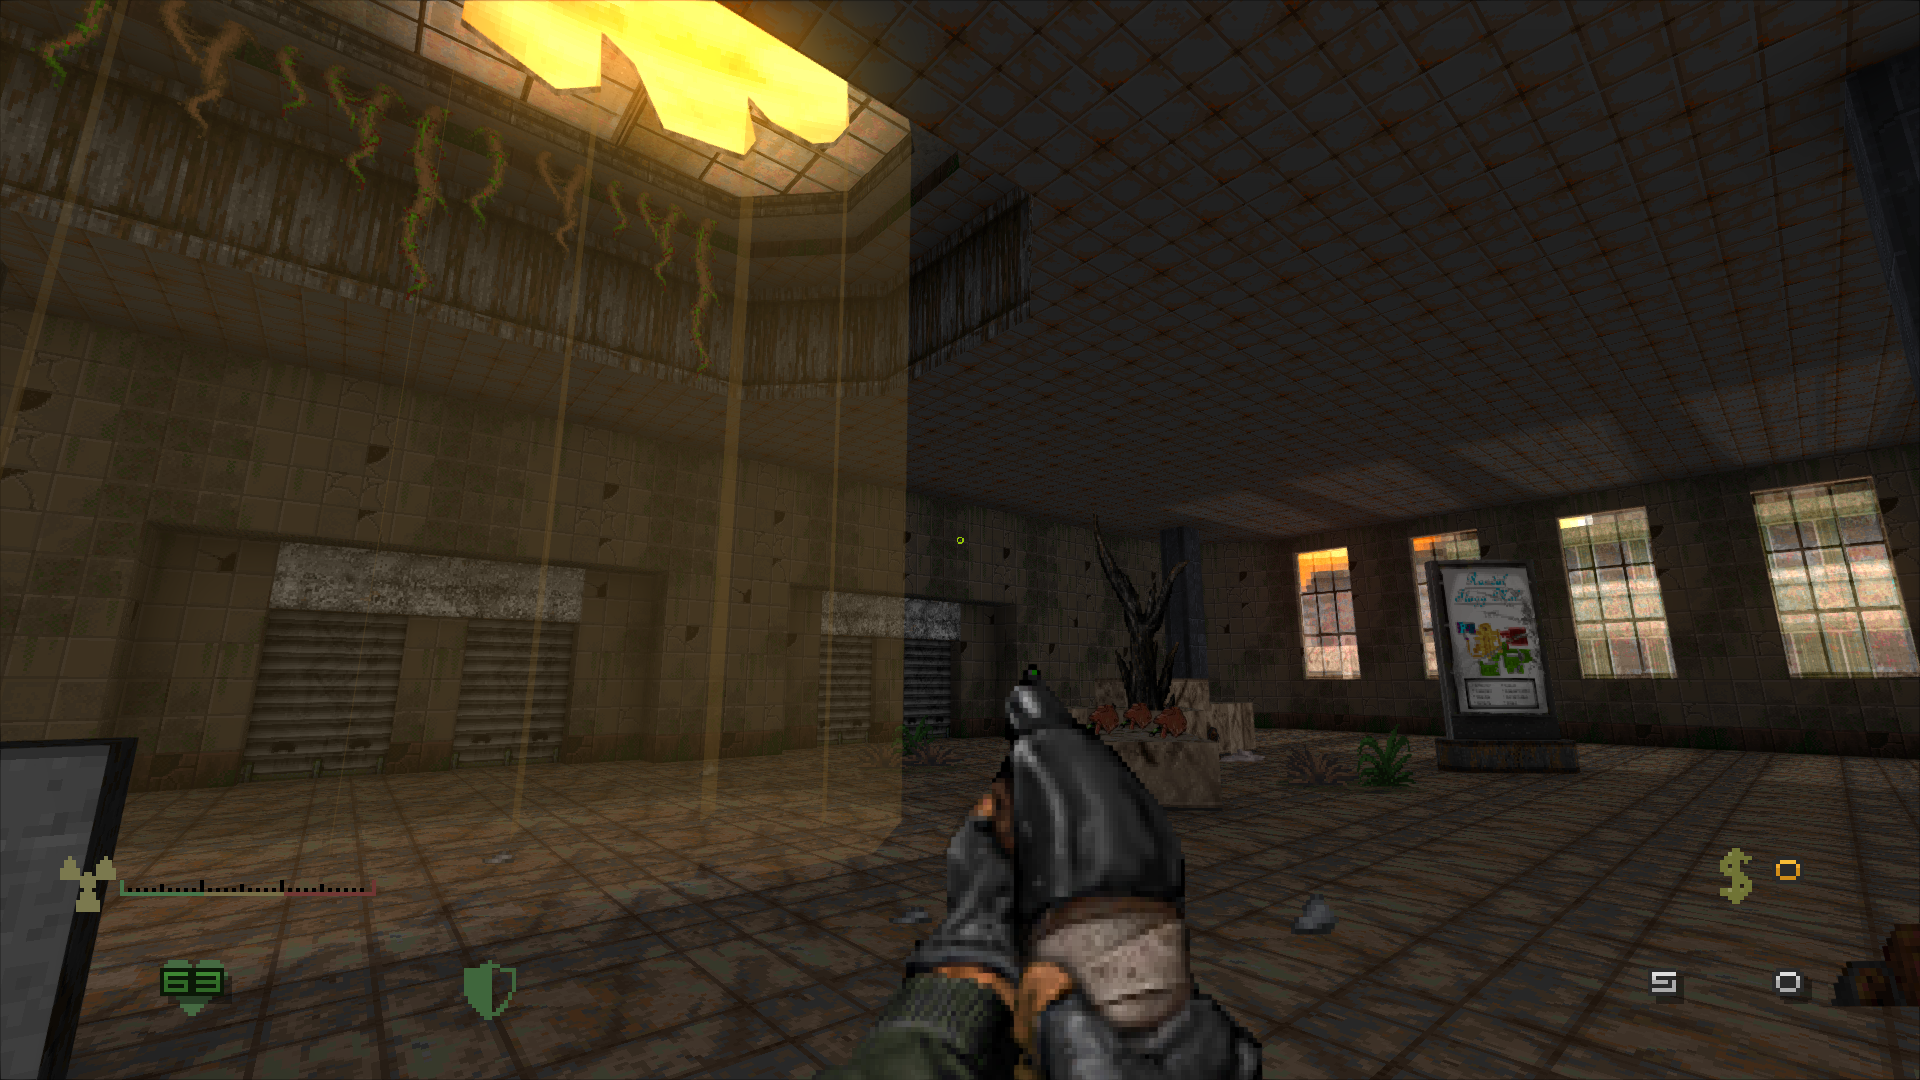 Ashes 2063 post apoc Doom mod launch | Rock Paper Shotgun